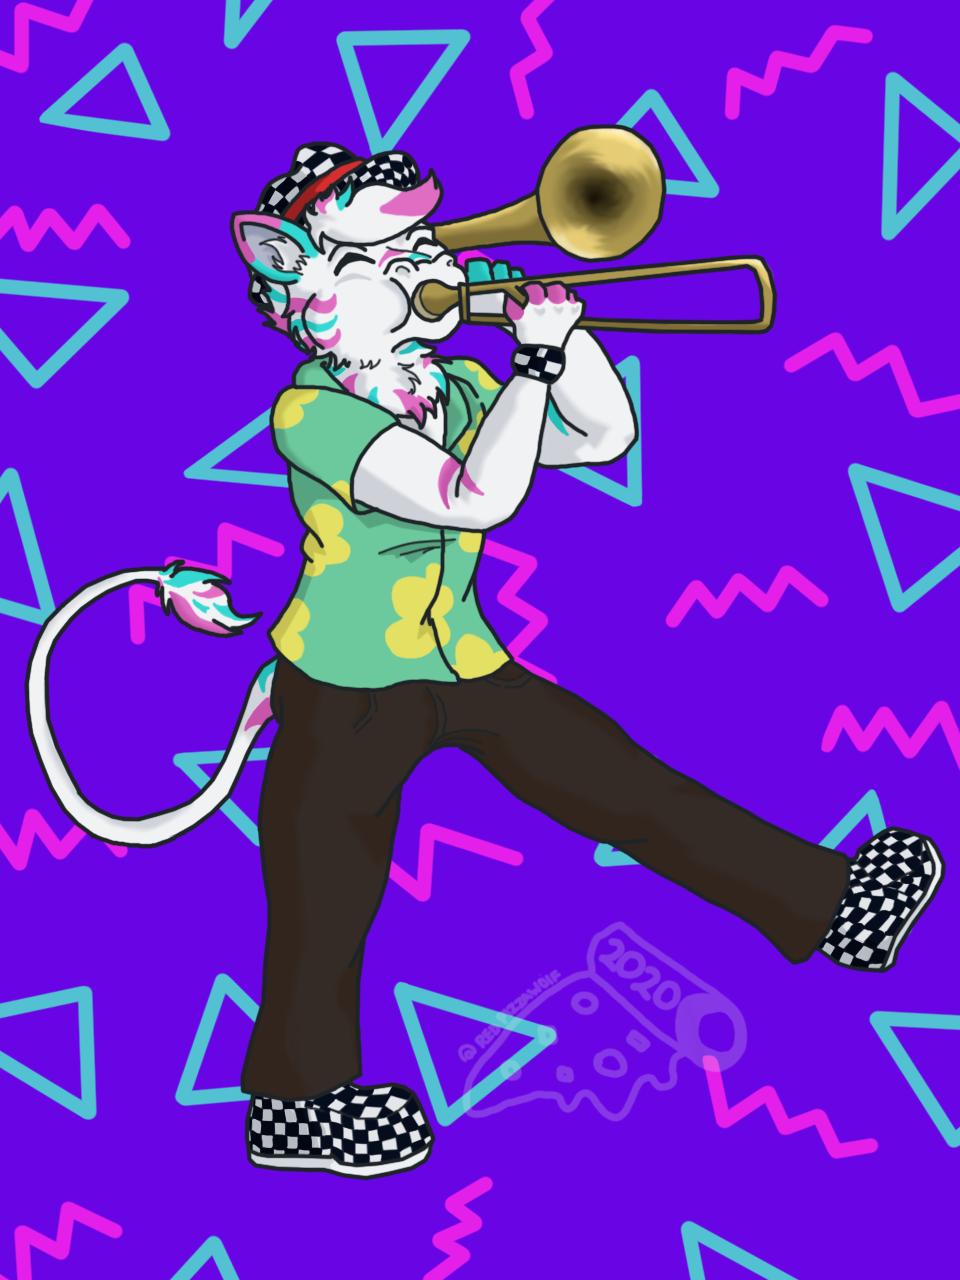 Most recent image: Trumpet dragon